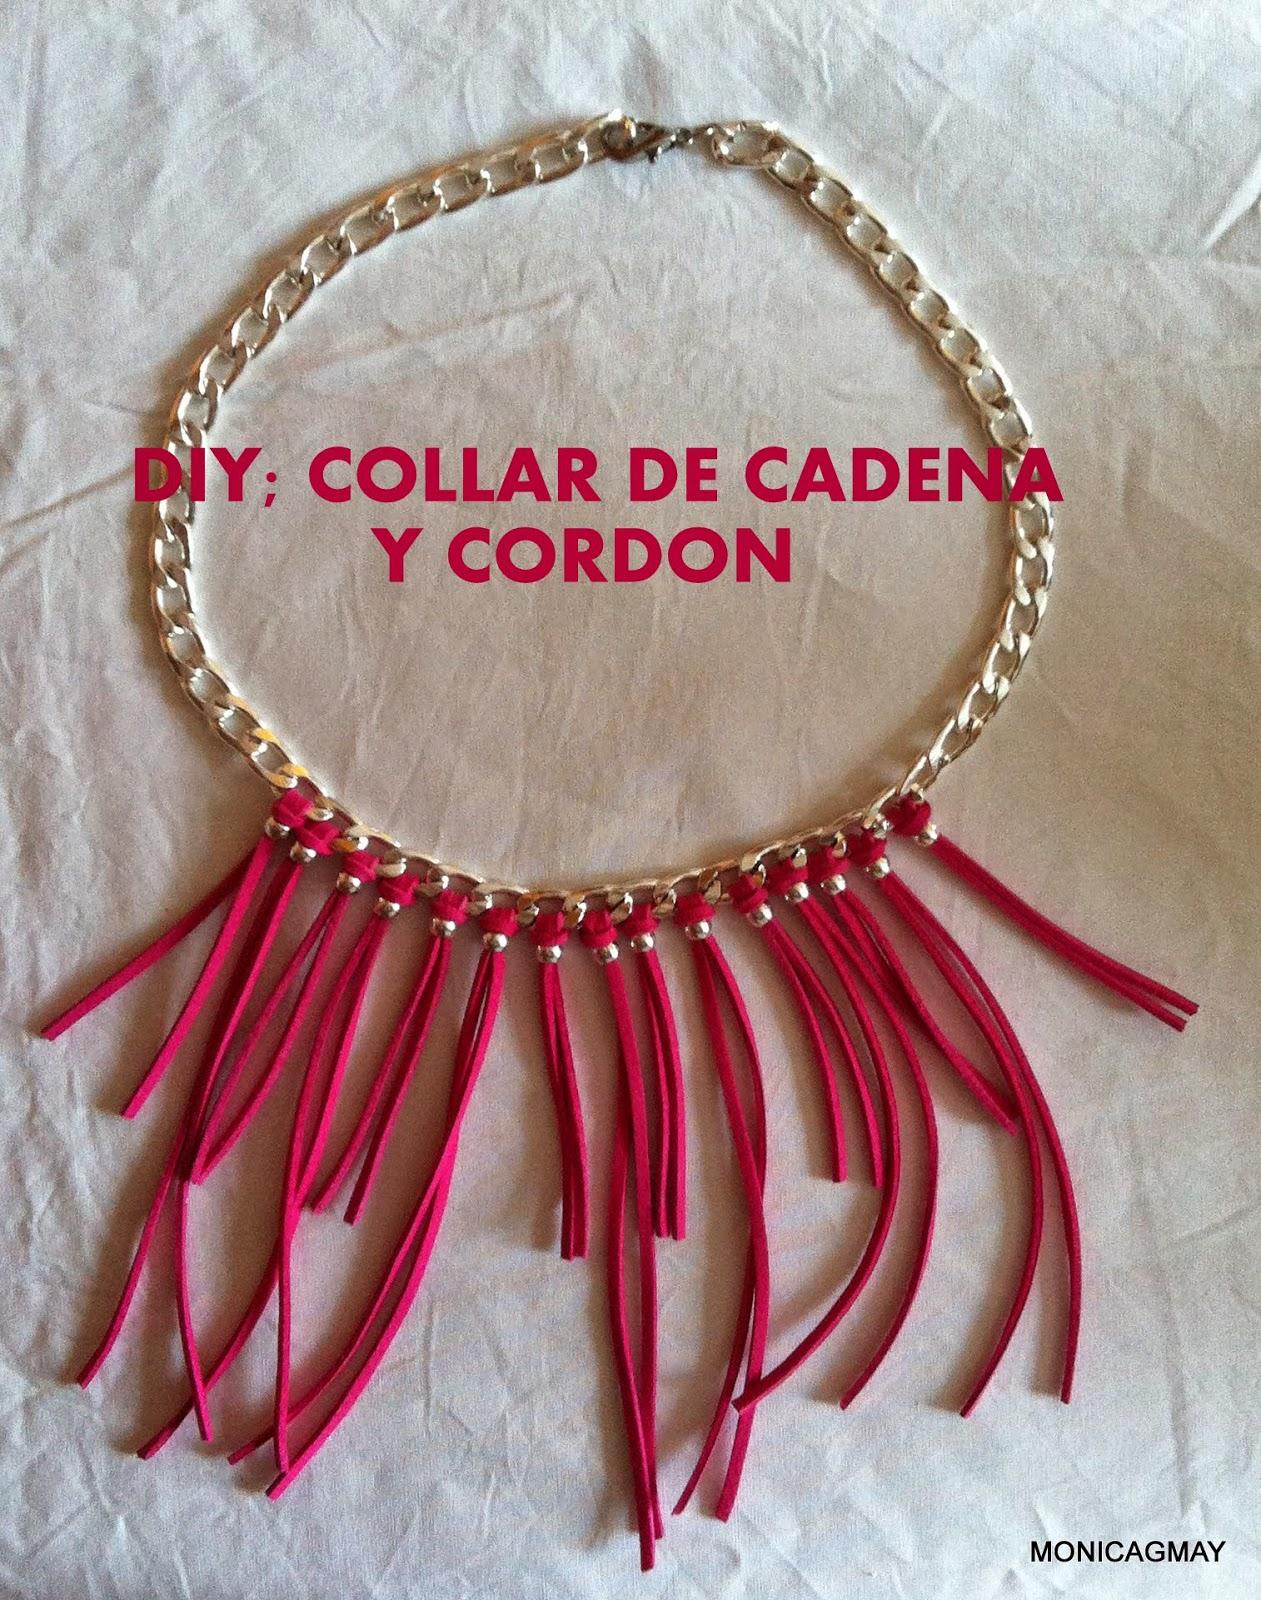 60d0f704db6e Costura Y Collar Moda Cordón Diy De Caiga Que Cadena Lo FYrFAnPwq in ...